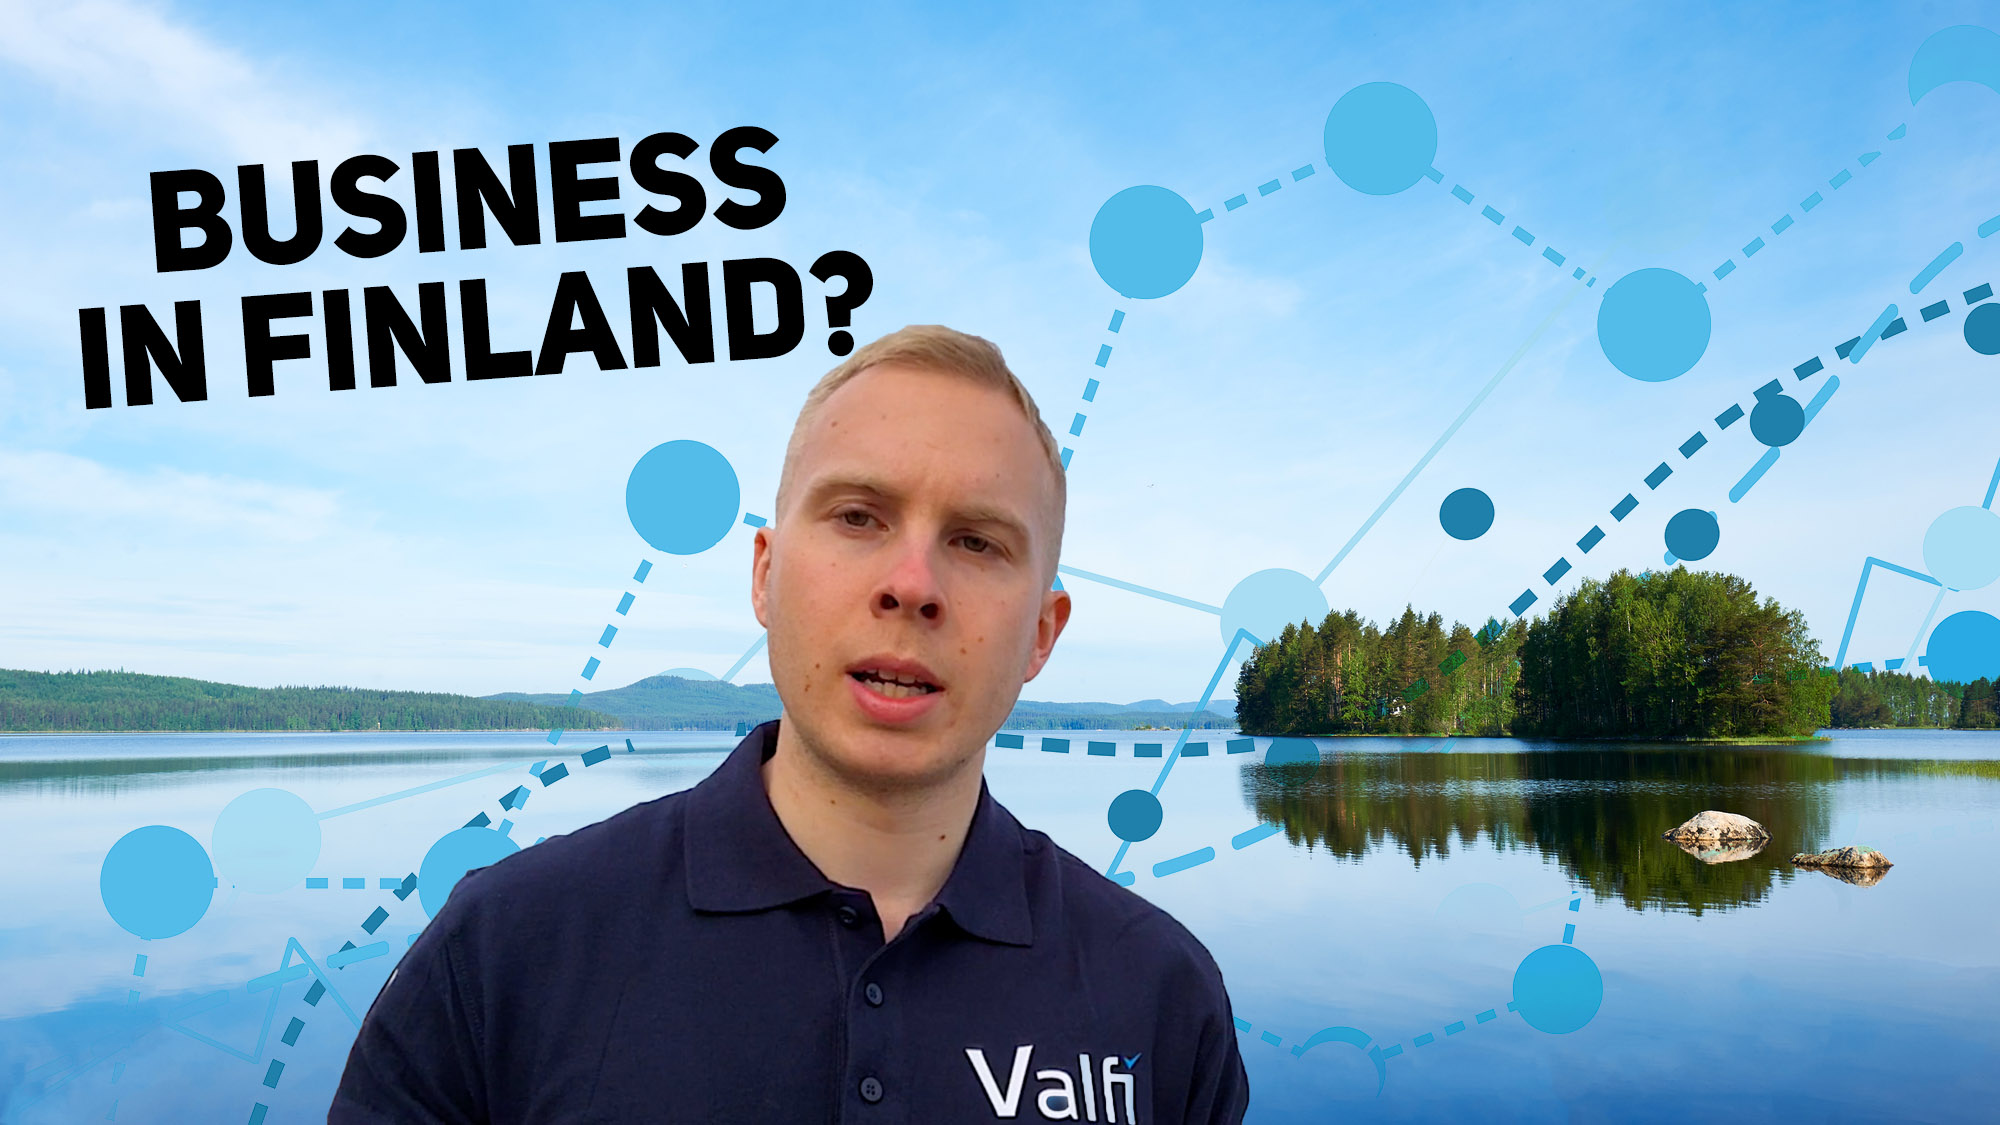 Miksi Valfi valitsi Suomen?